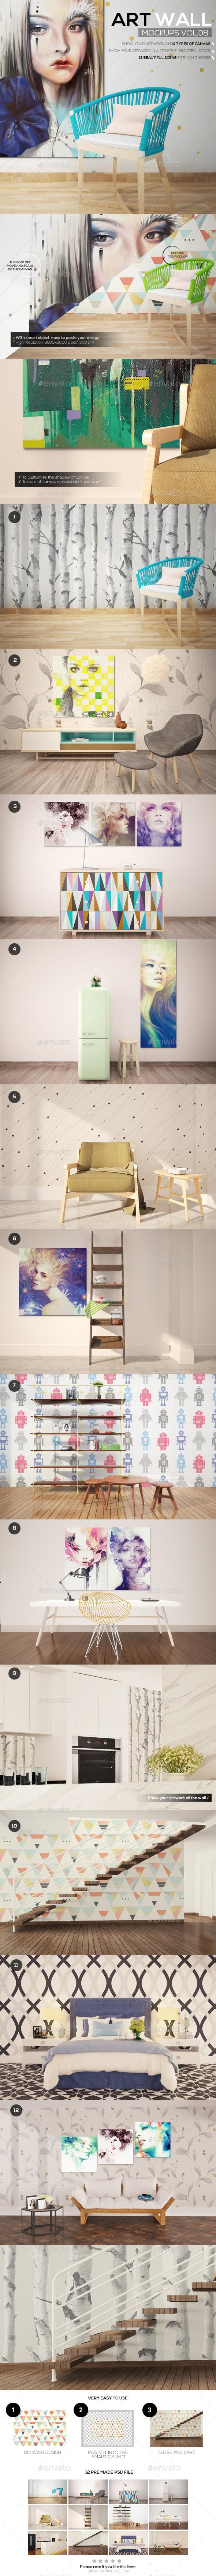 Art Wall Mockups Vol8 - Miscellaneous Print